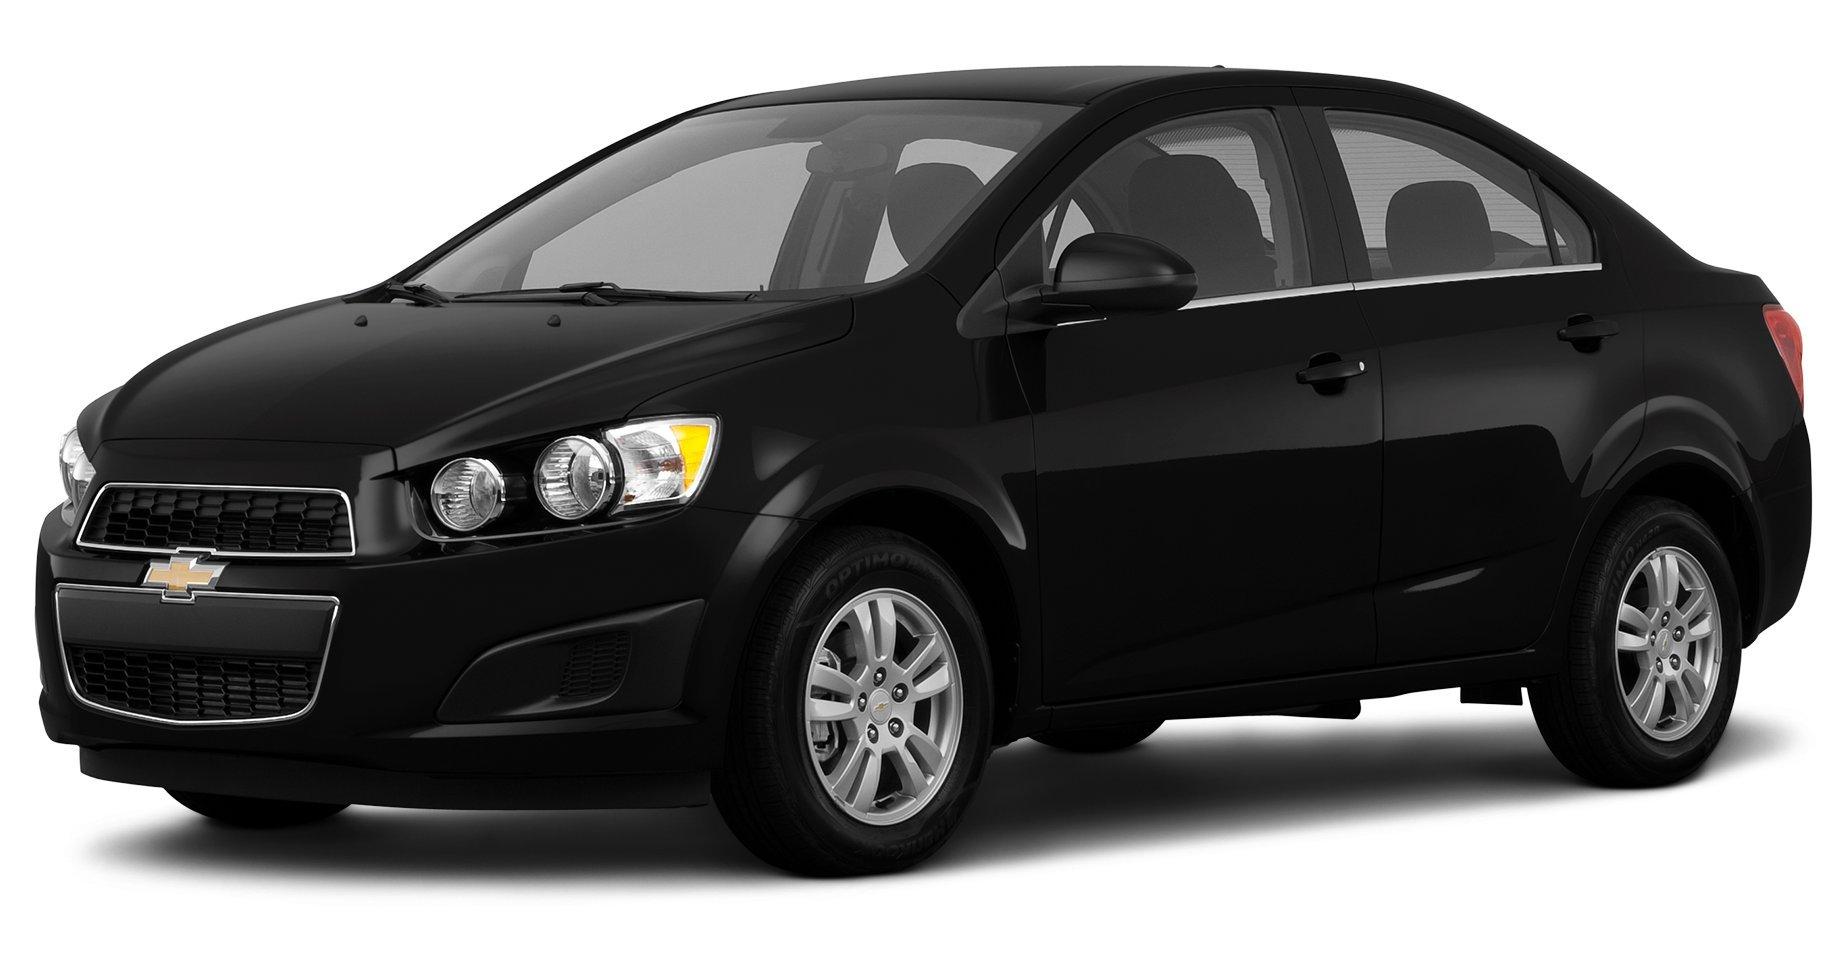 Amazon 2013 nissan sentra reviews images and specs vehicles 2013 chevrolet sonic lt 4 door sedan vanachro Images